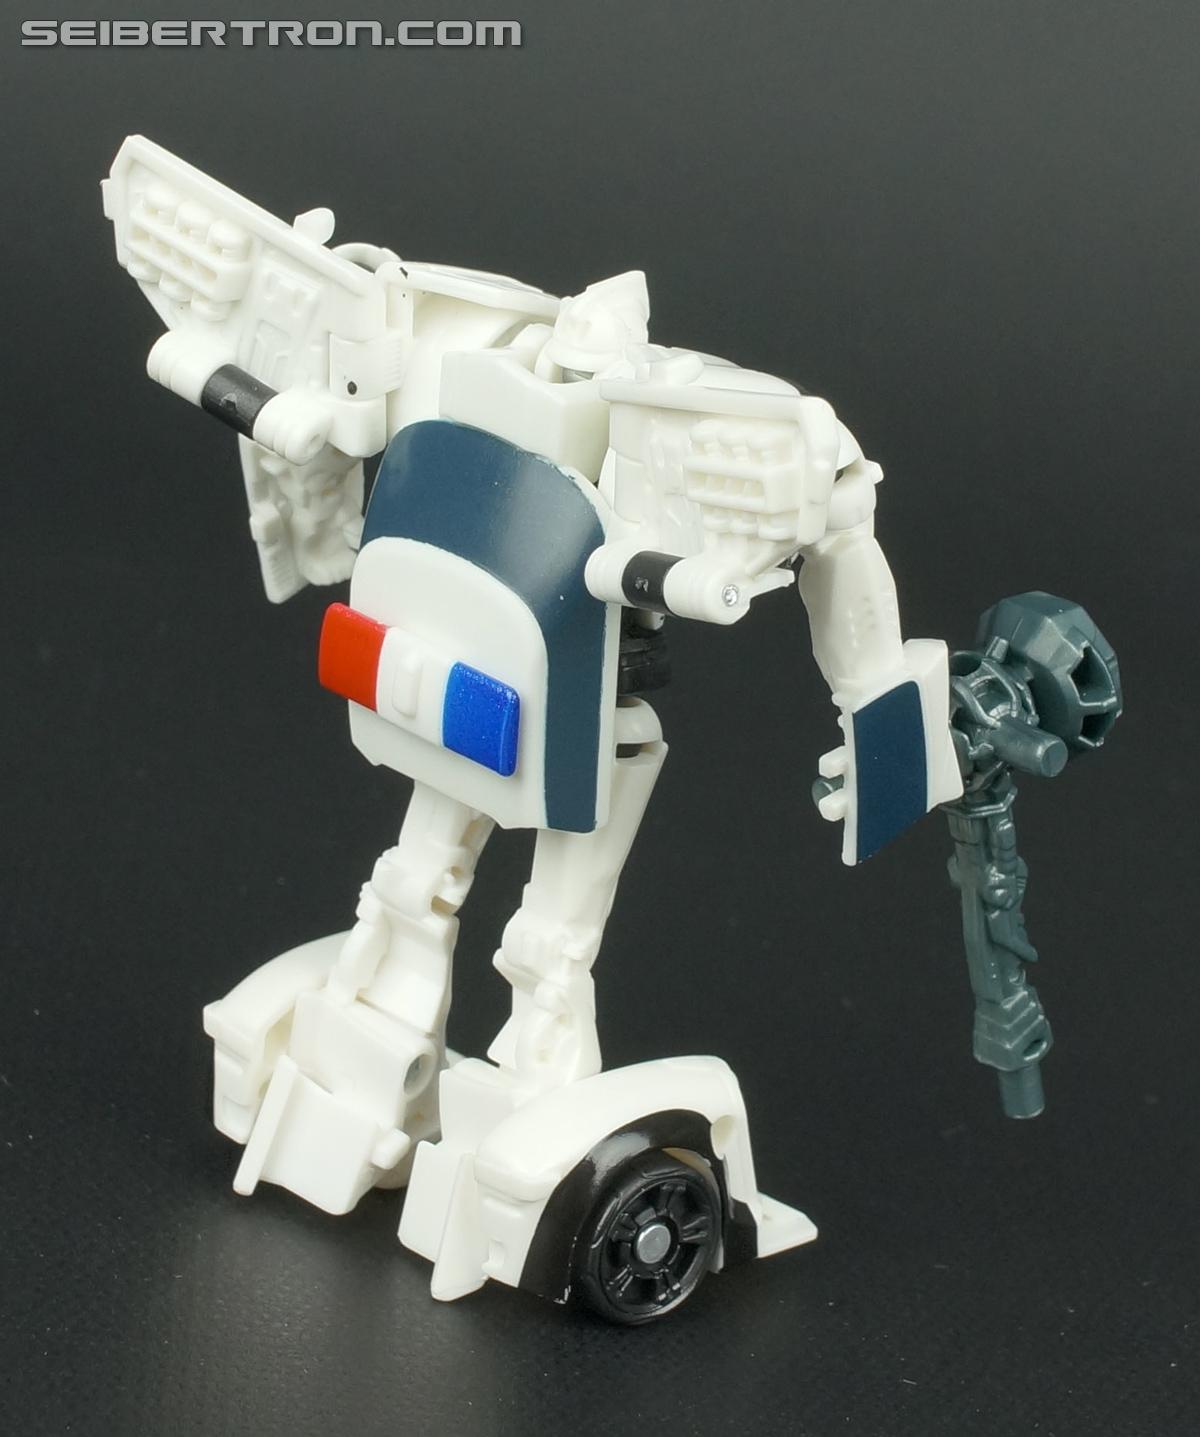 Transformers Prime Beast Hunters Cyberverse Prowl (Image #51 of 87)